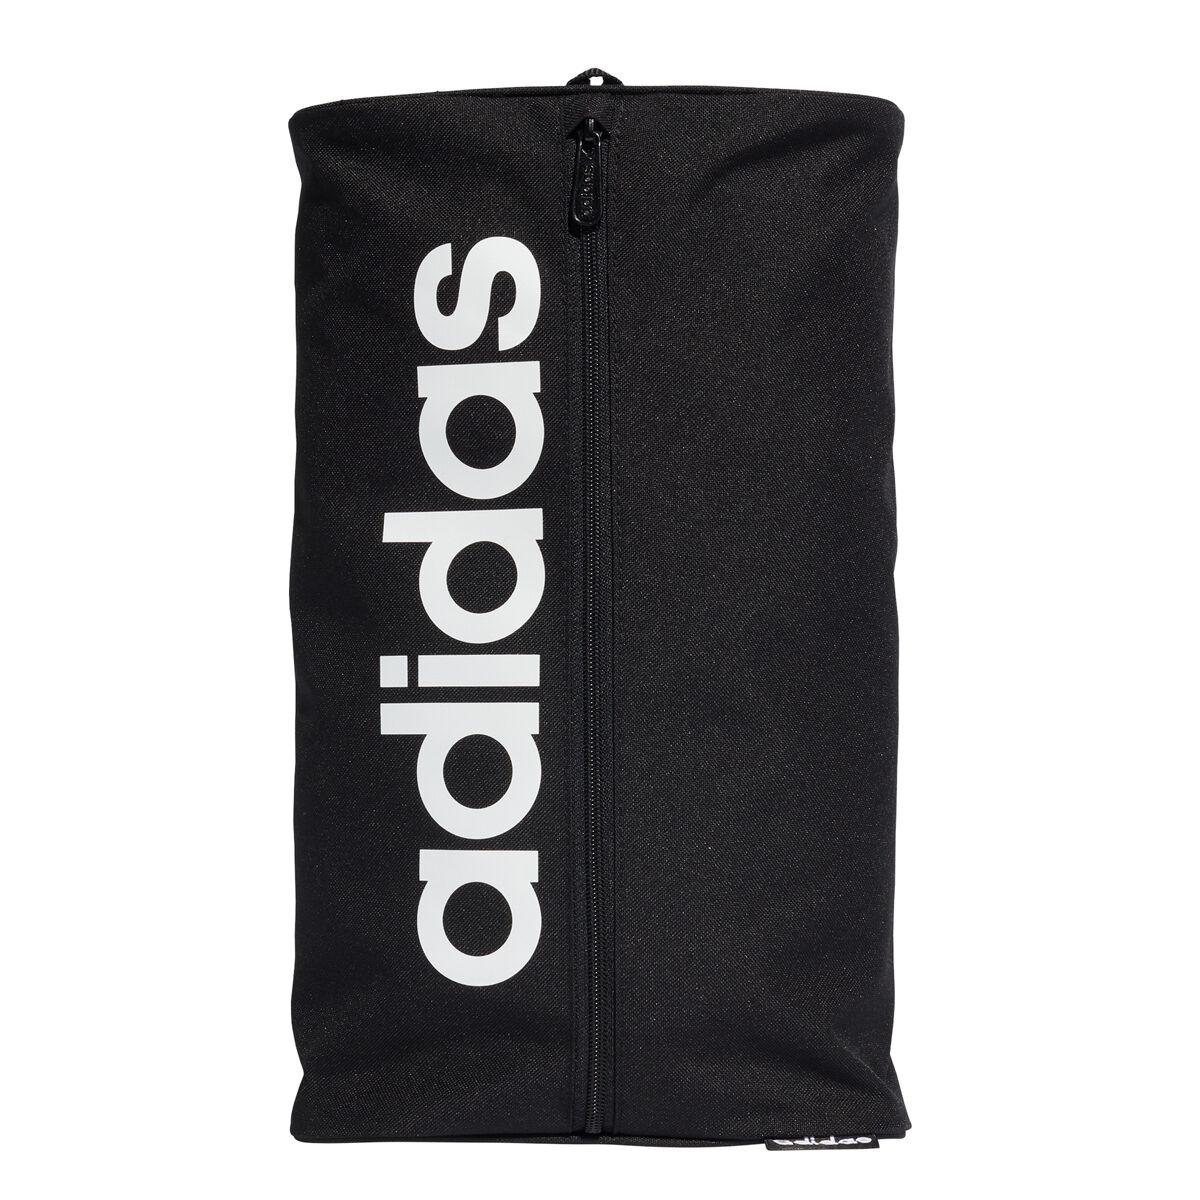 glow in the dark nike running leggings best price | adidas Linear Shoe Bag